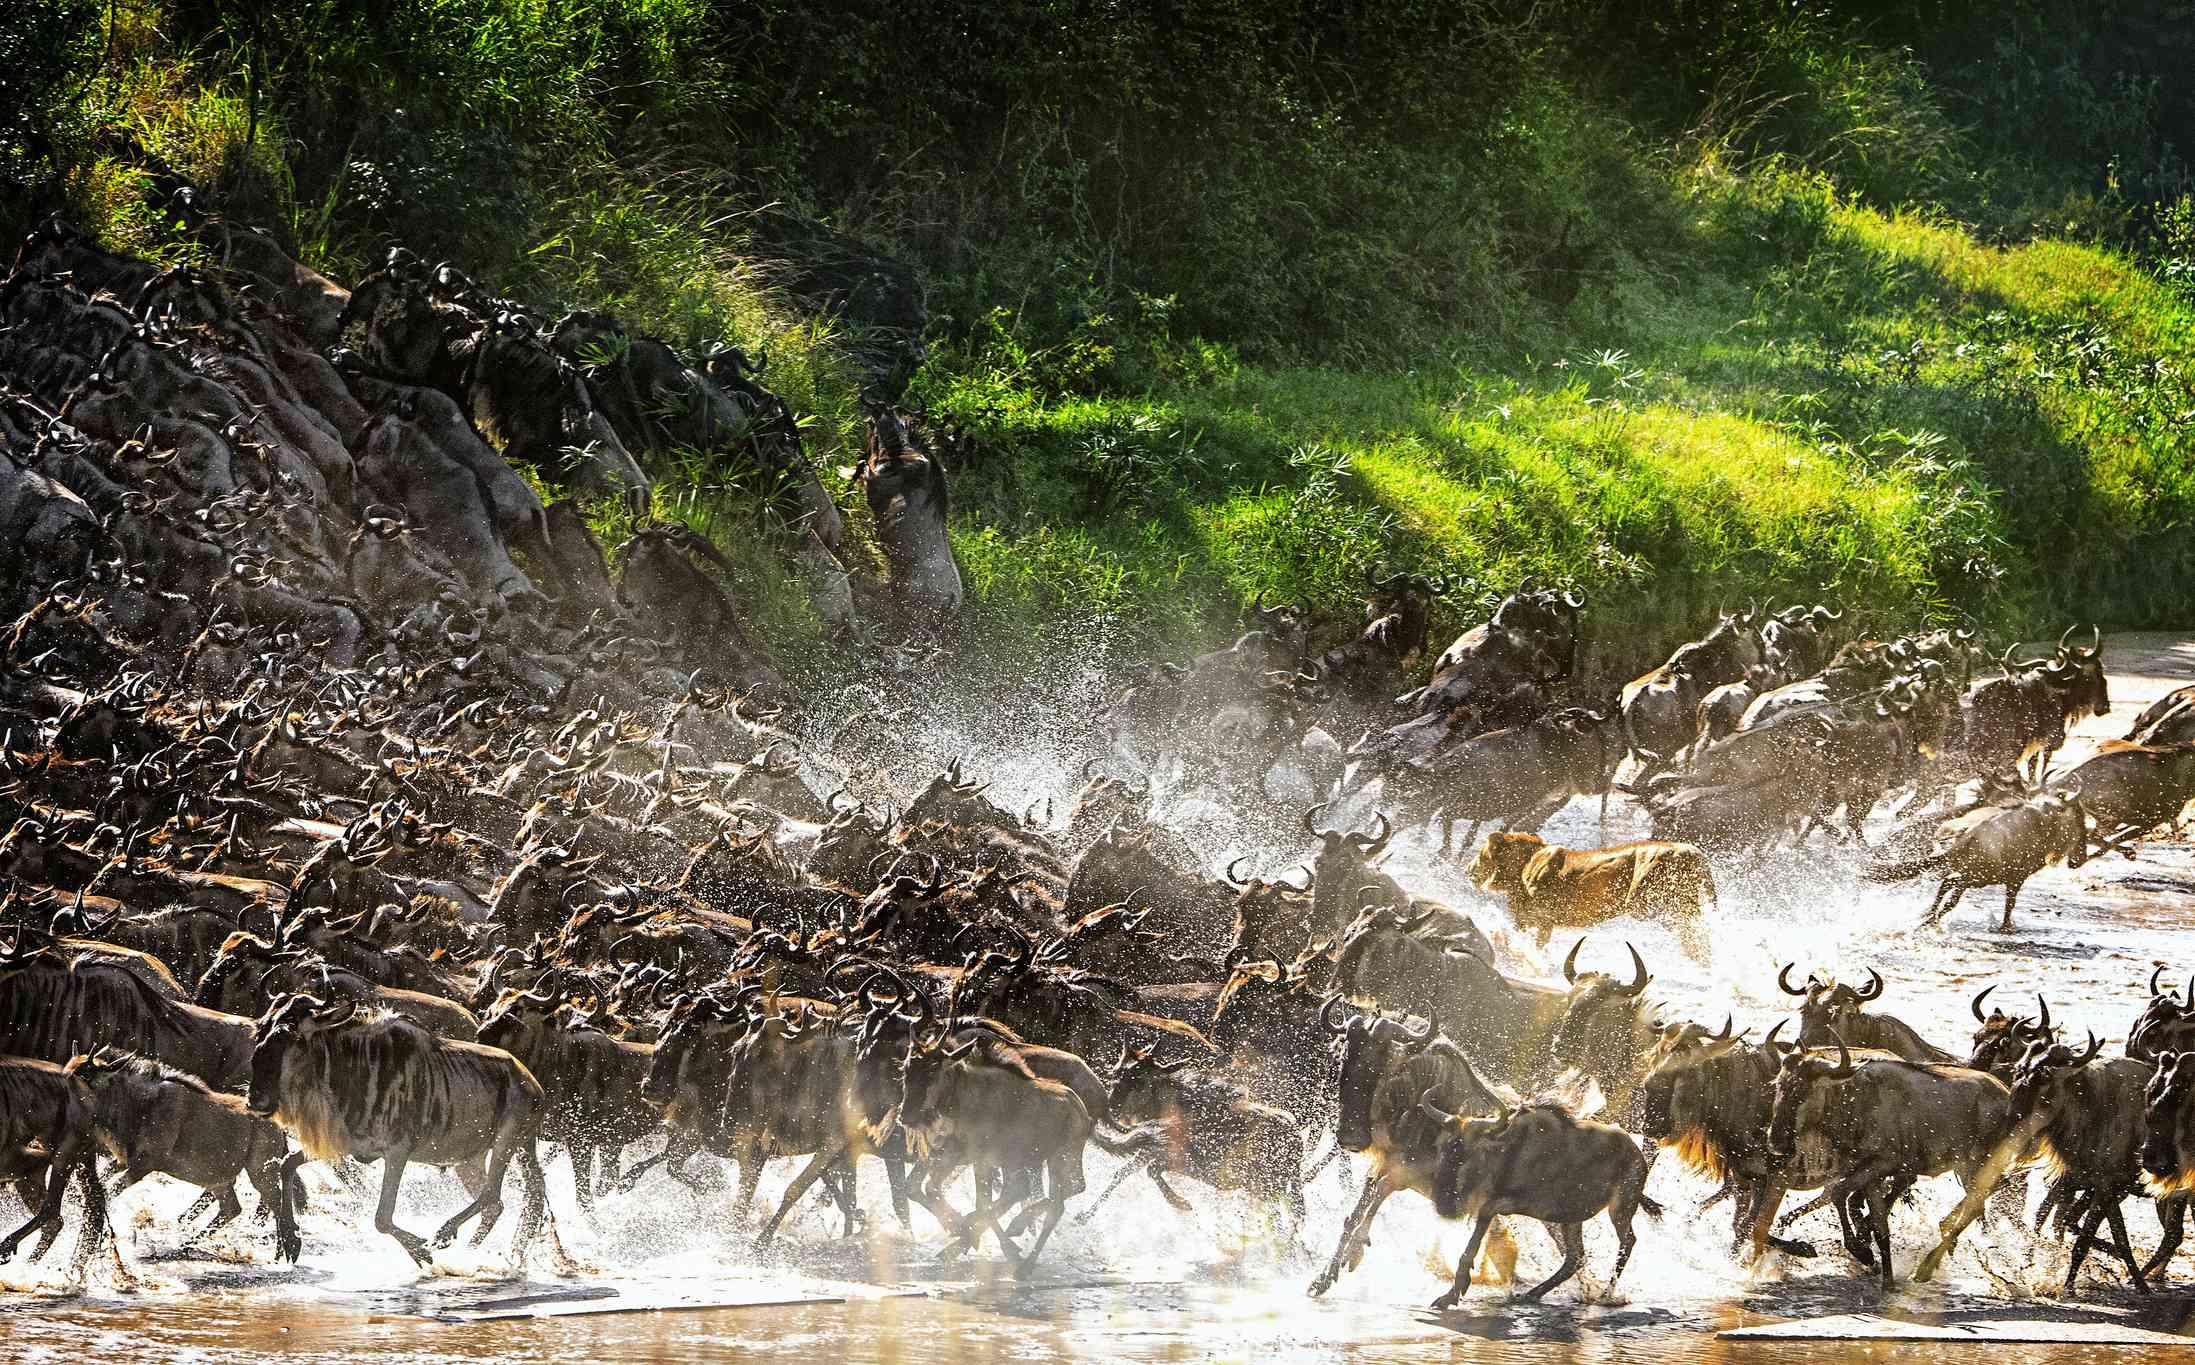 Lion chasing migrating wildebeest, Serengeti National Park